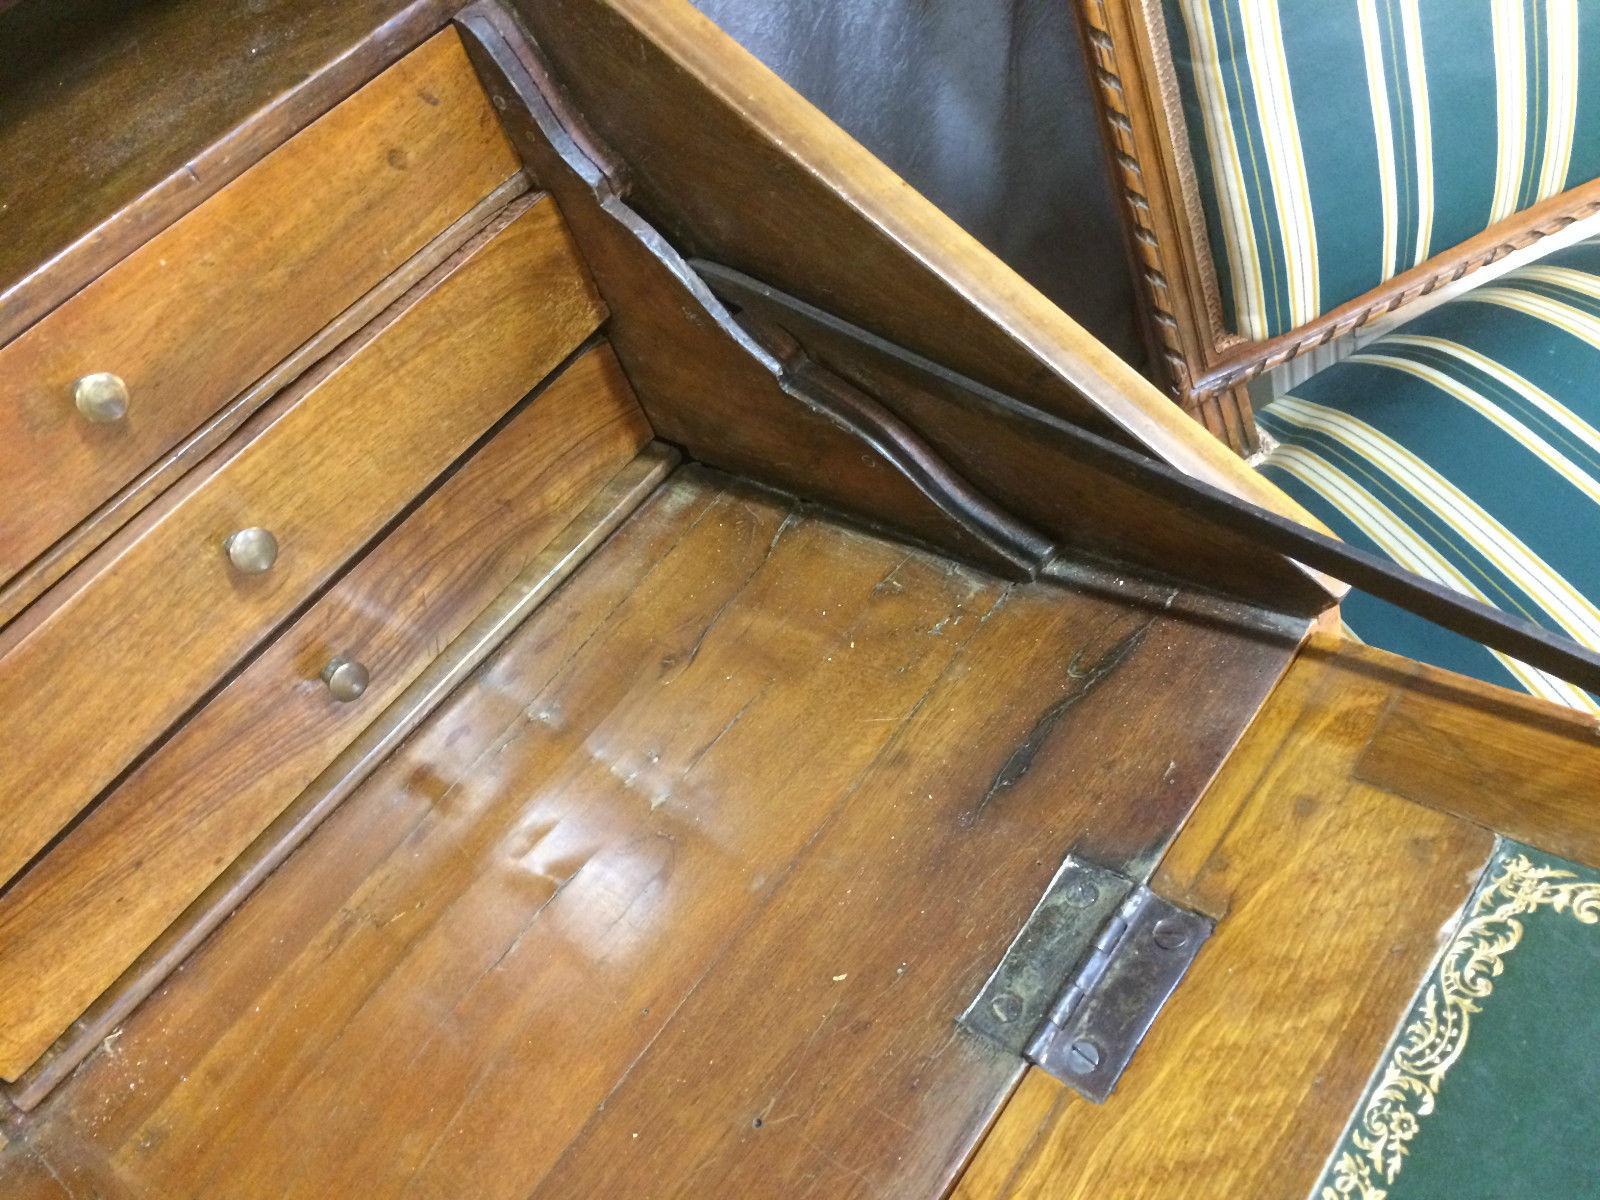 57 829 brocante de la ferme. Black Bedroom Furniture Sets. Home Design Ideas